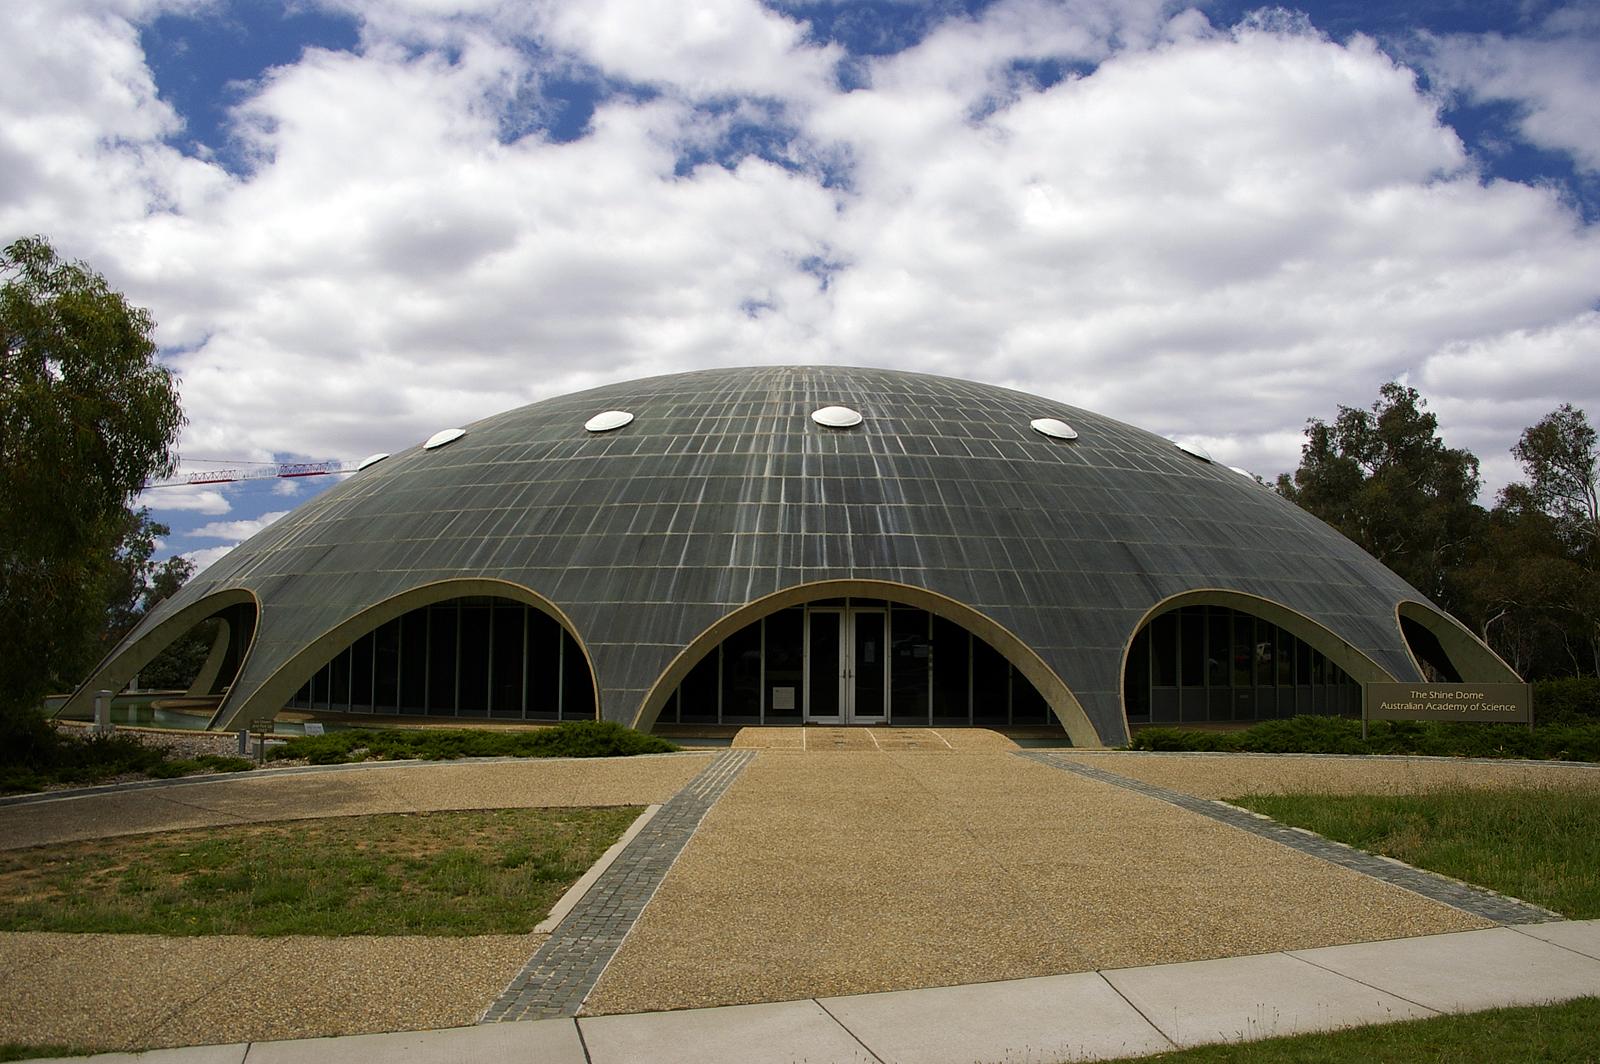 Australian Academy of Science: Shine Dome